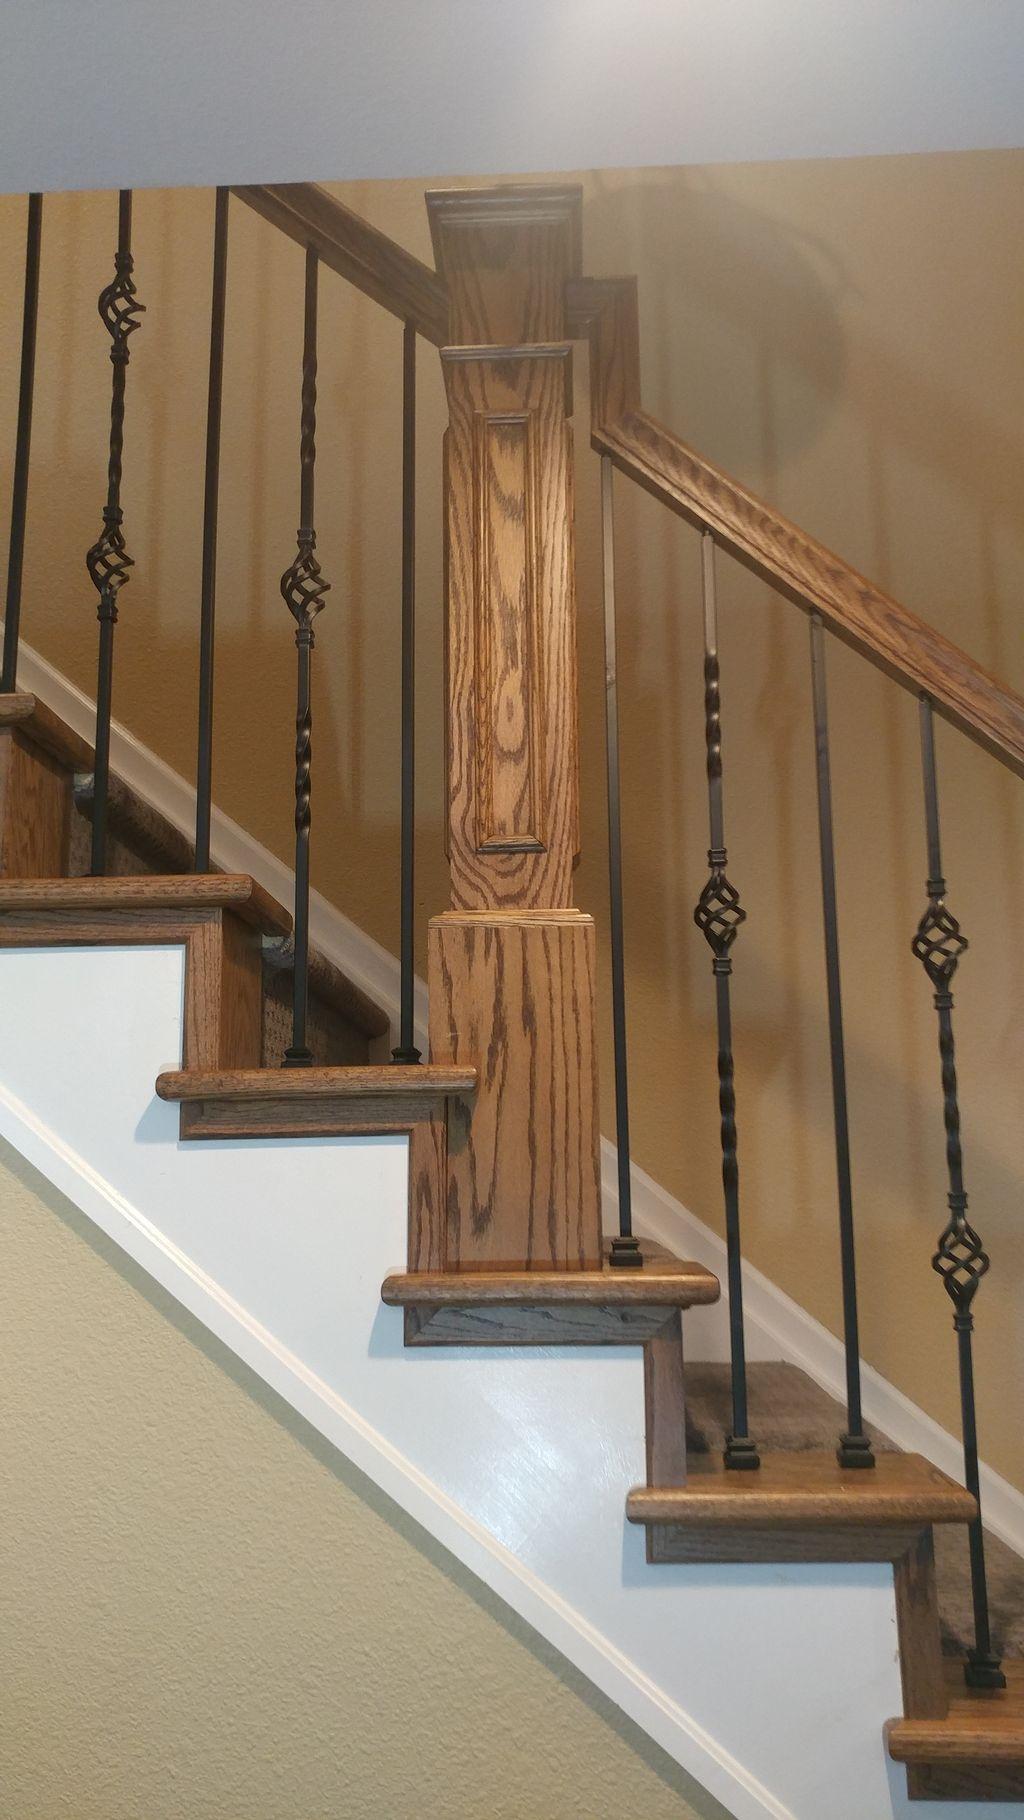 Railing Installation or Remodel - Littleton 2019